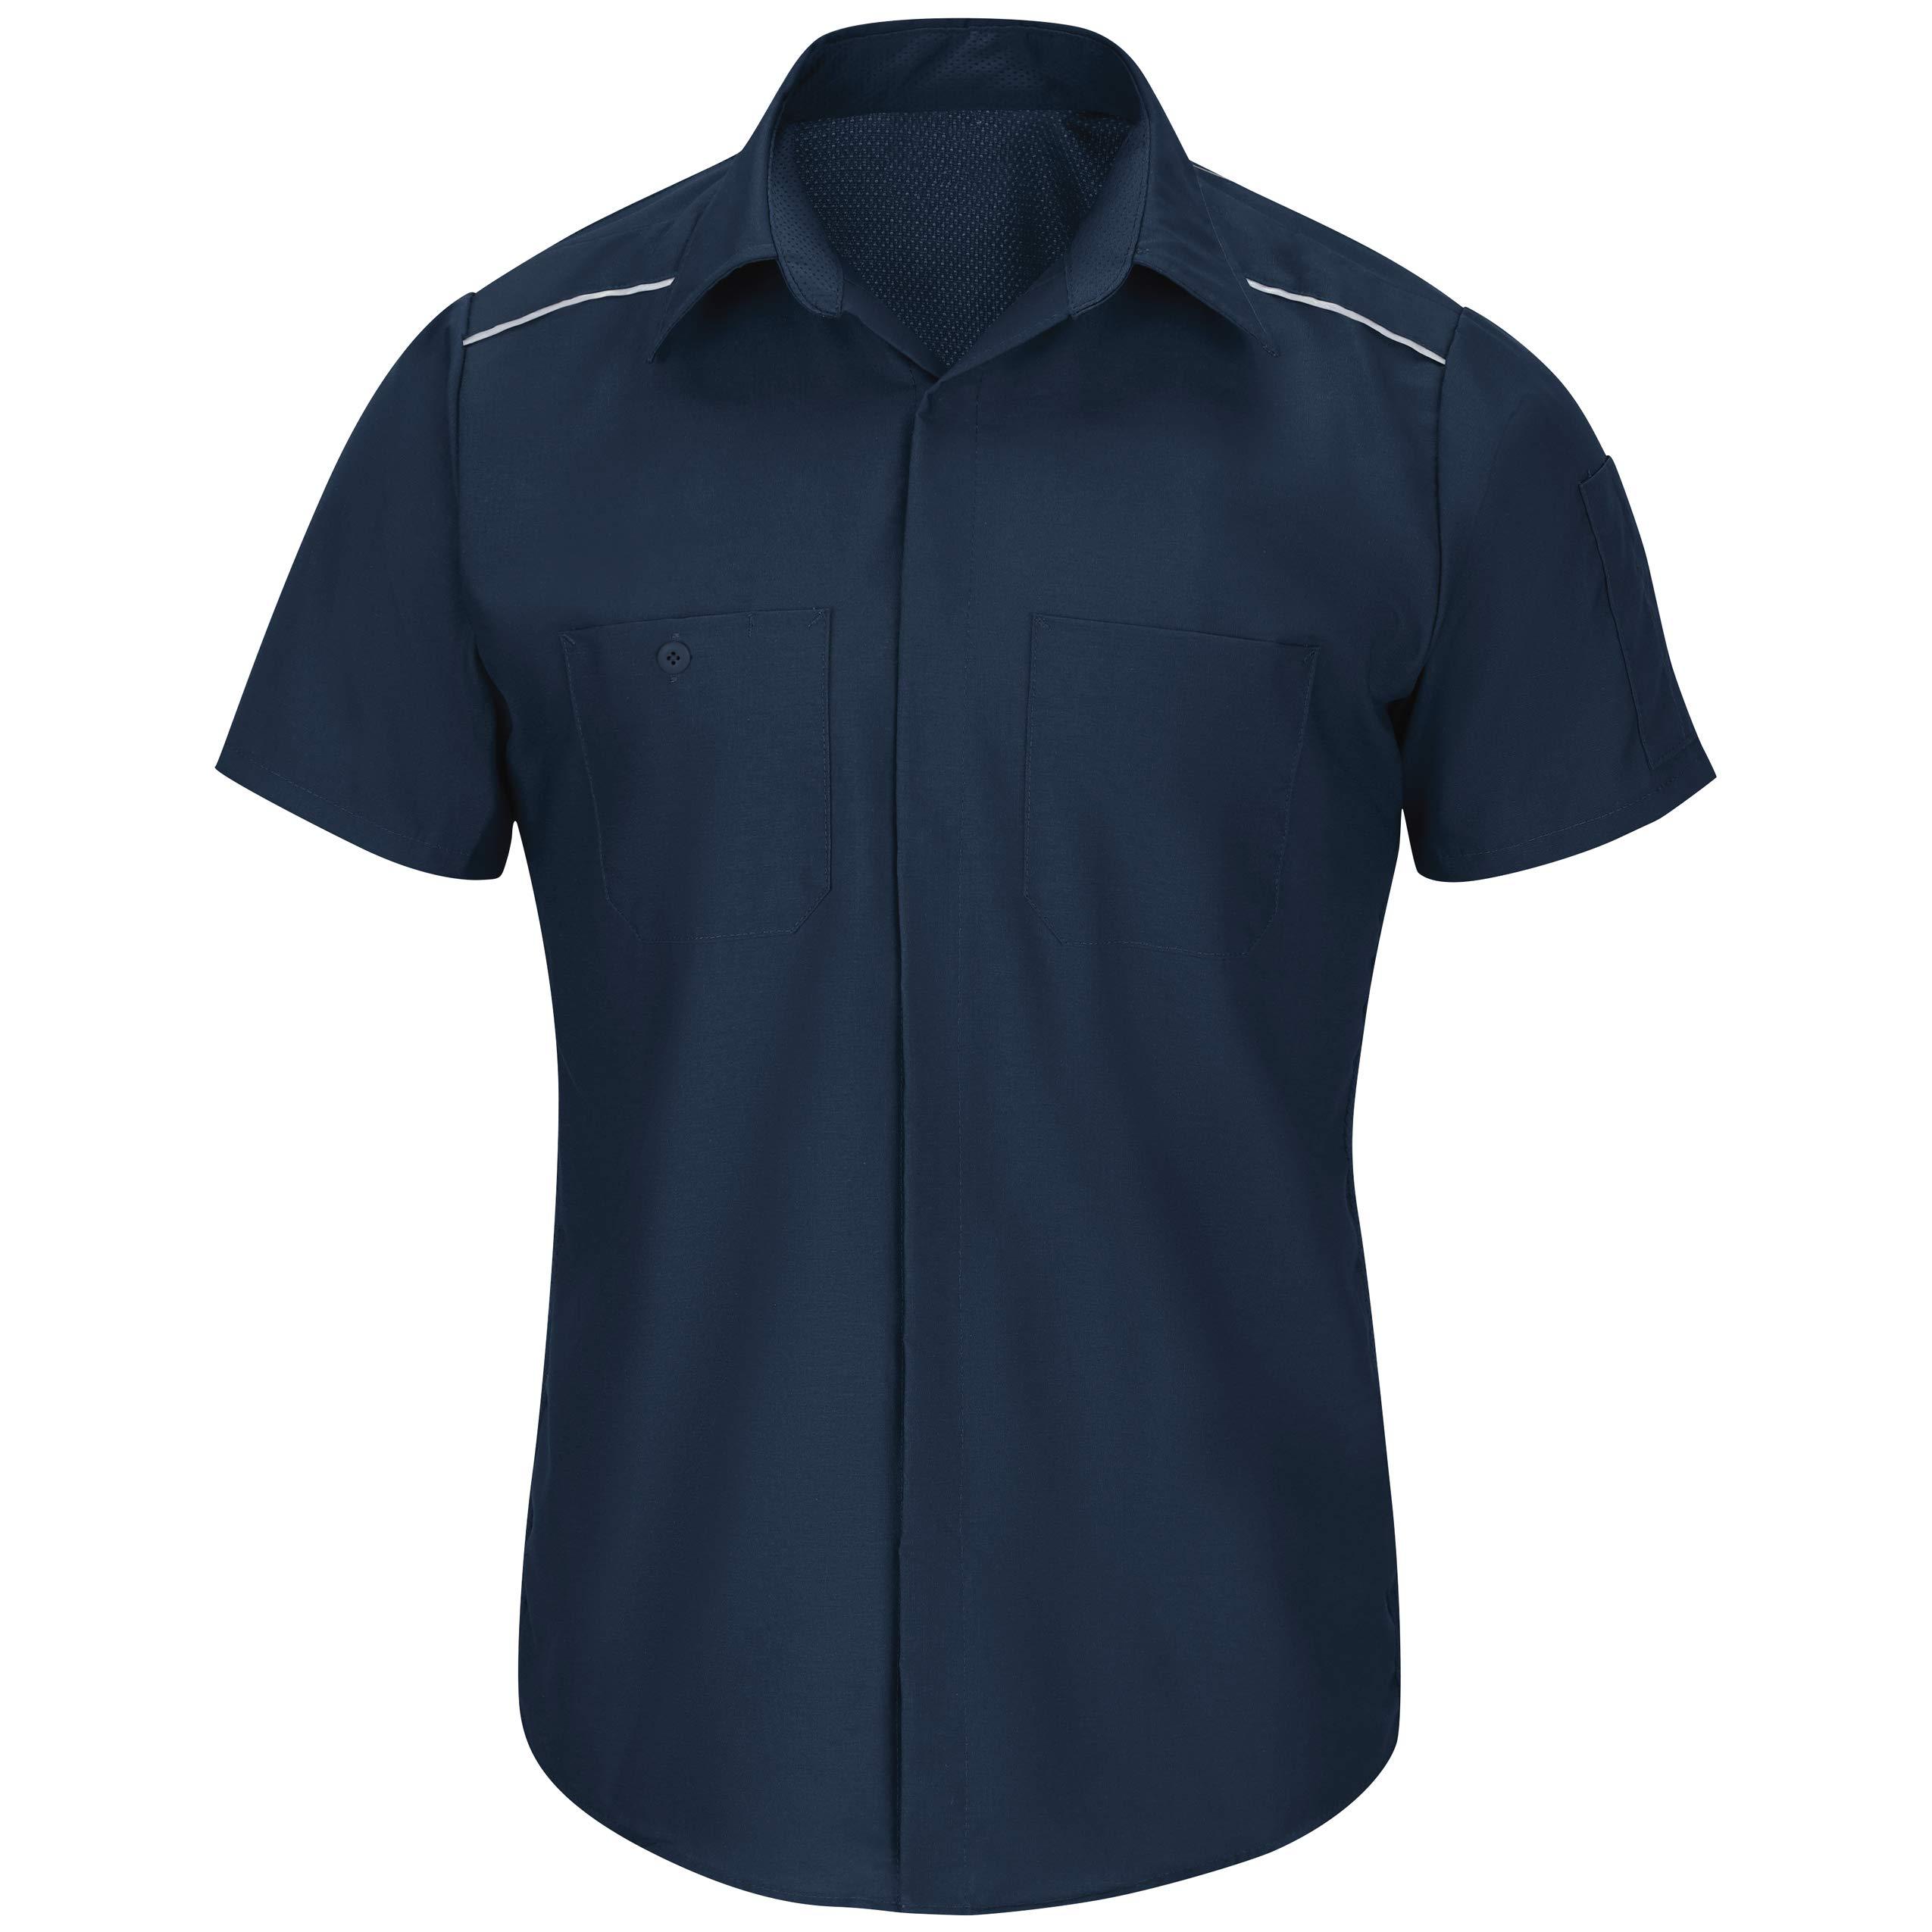 Red Kap Women's Short Sleeve Pro Airflow Work Shirt